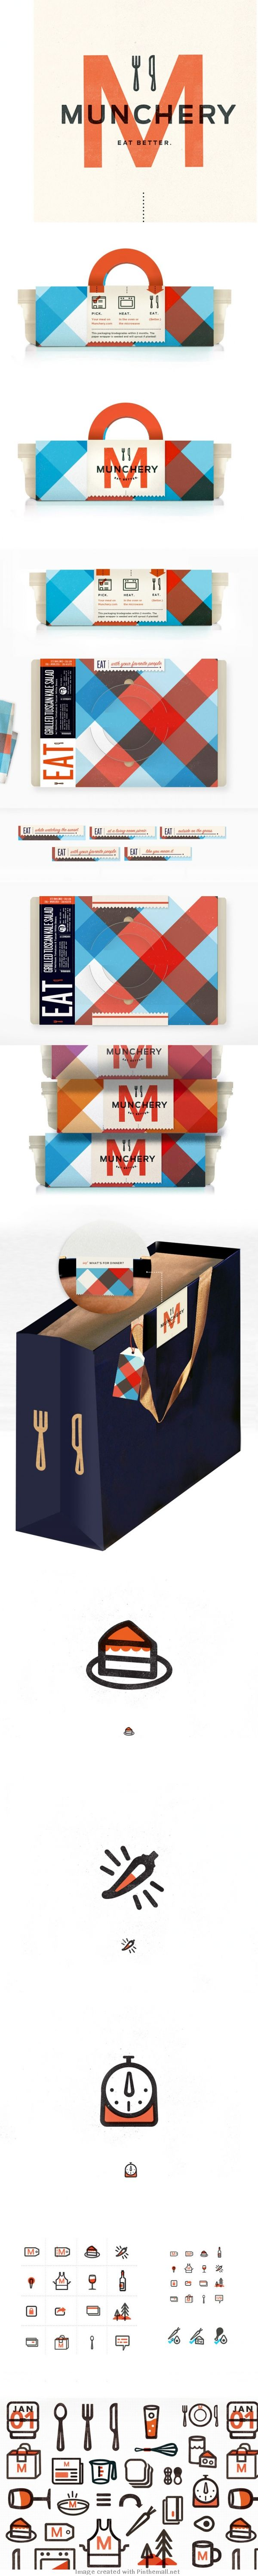 #branding #identity #layout